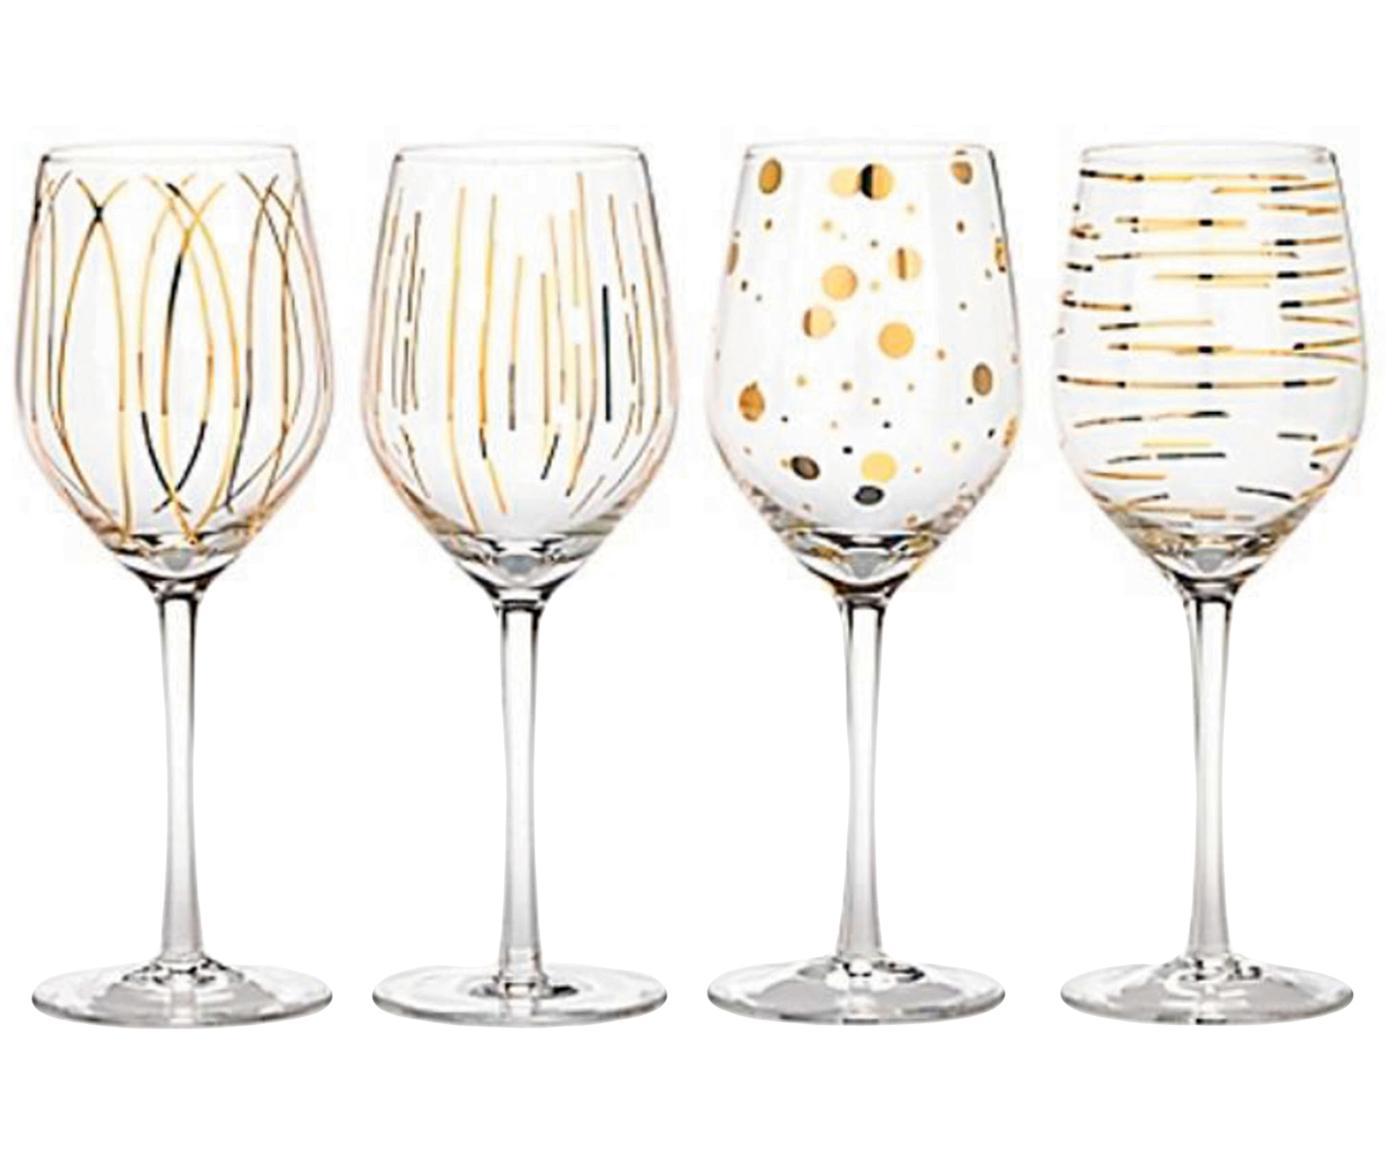 Set 4 bicchieri vino bianco con decoro Mikasa Cheers, Vetro, Trasparente, dorato, Ø 9 x Alt. 25 cm